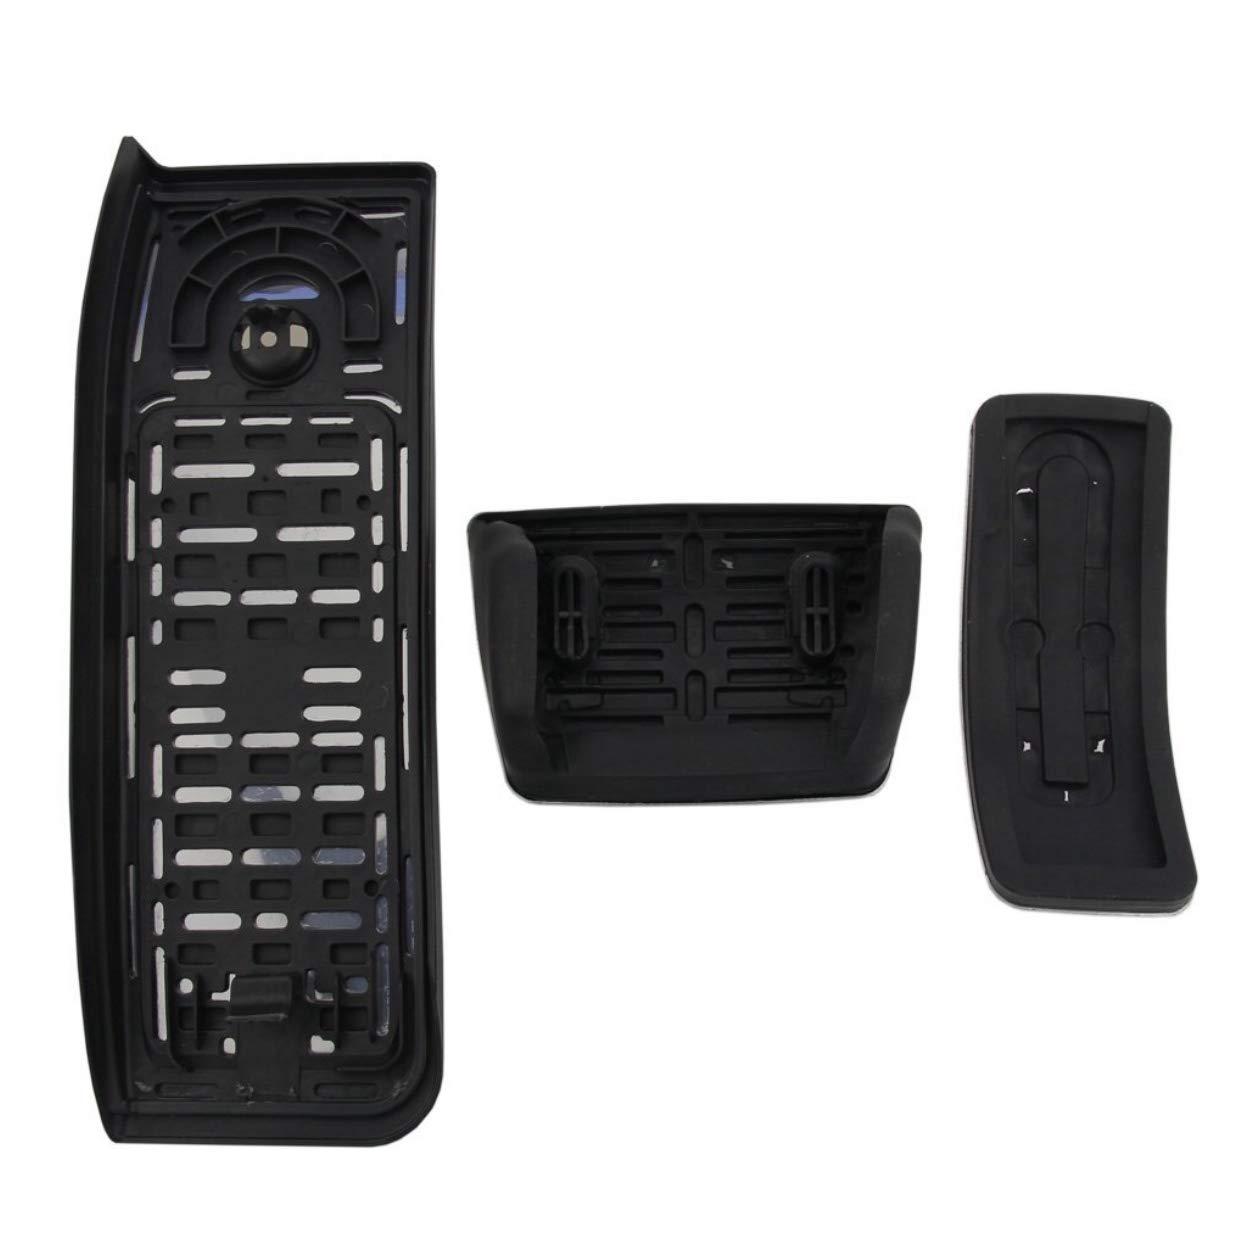 para A4 B9 A5 S5 Q5 80A TDI TSI S-line transmisi/ón autom/ática Tapones de pedal de acero inoxidable FFZ Parts